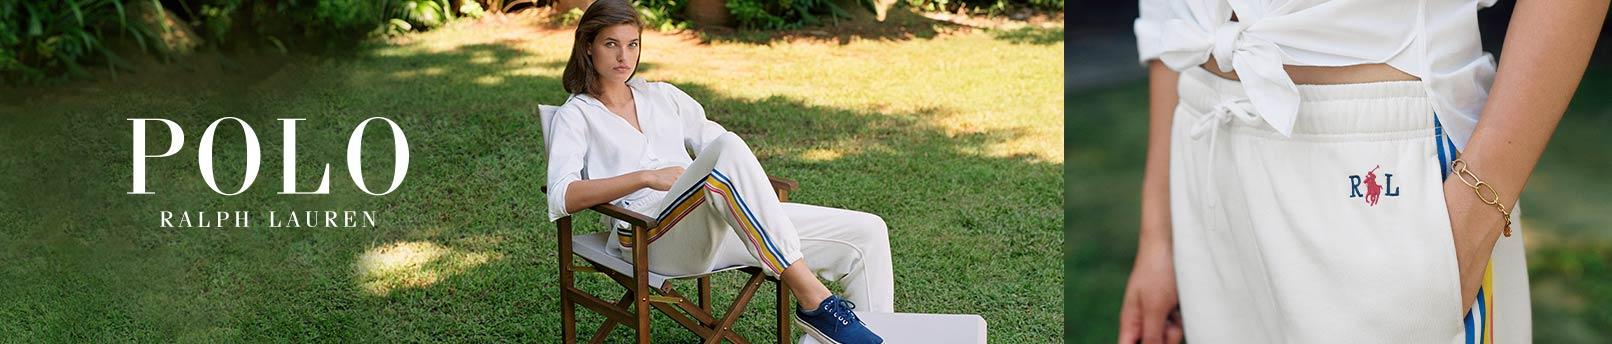 Odkryj Polo Ralph Lauren